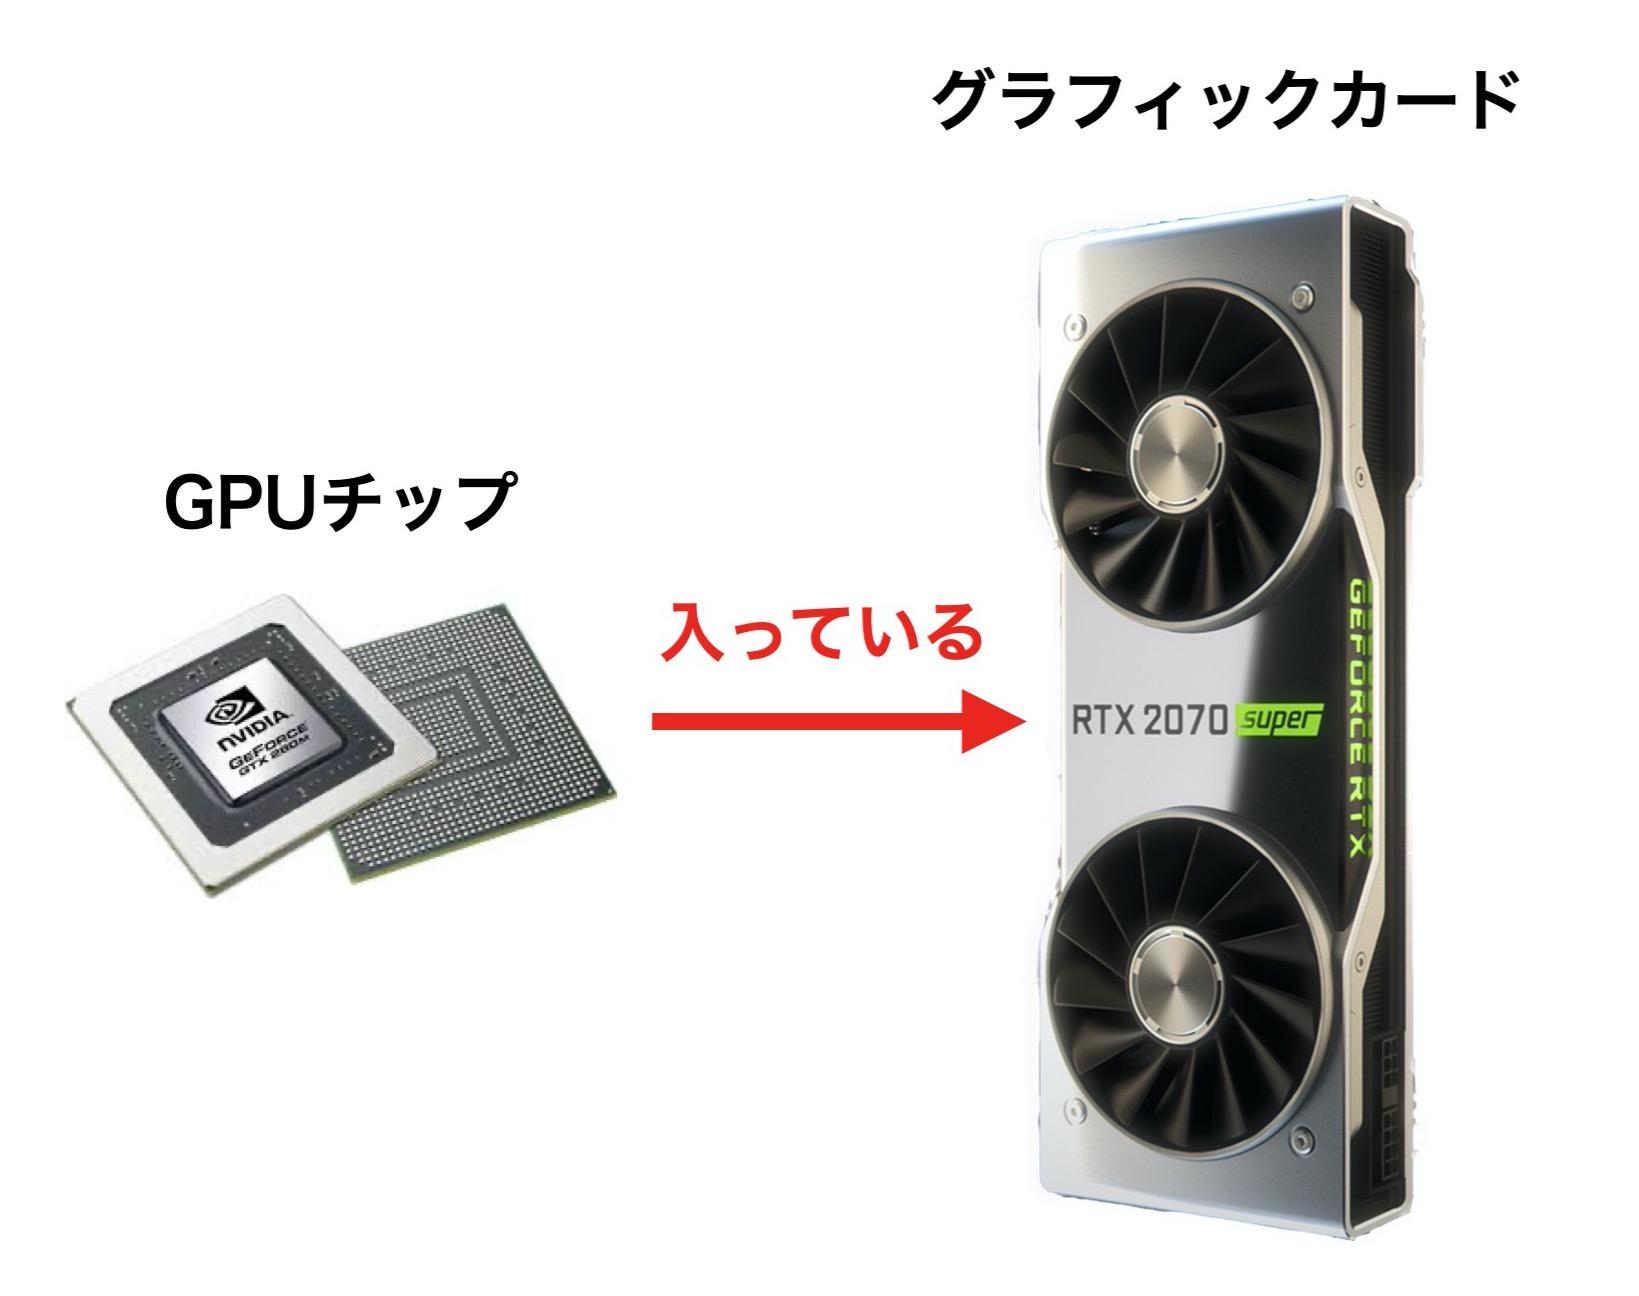 GPUとグラフィックカード